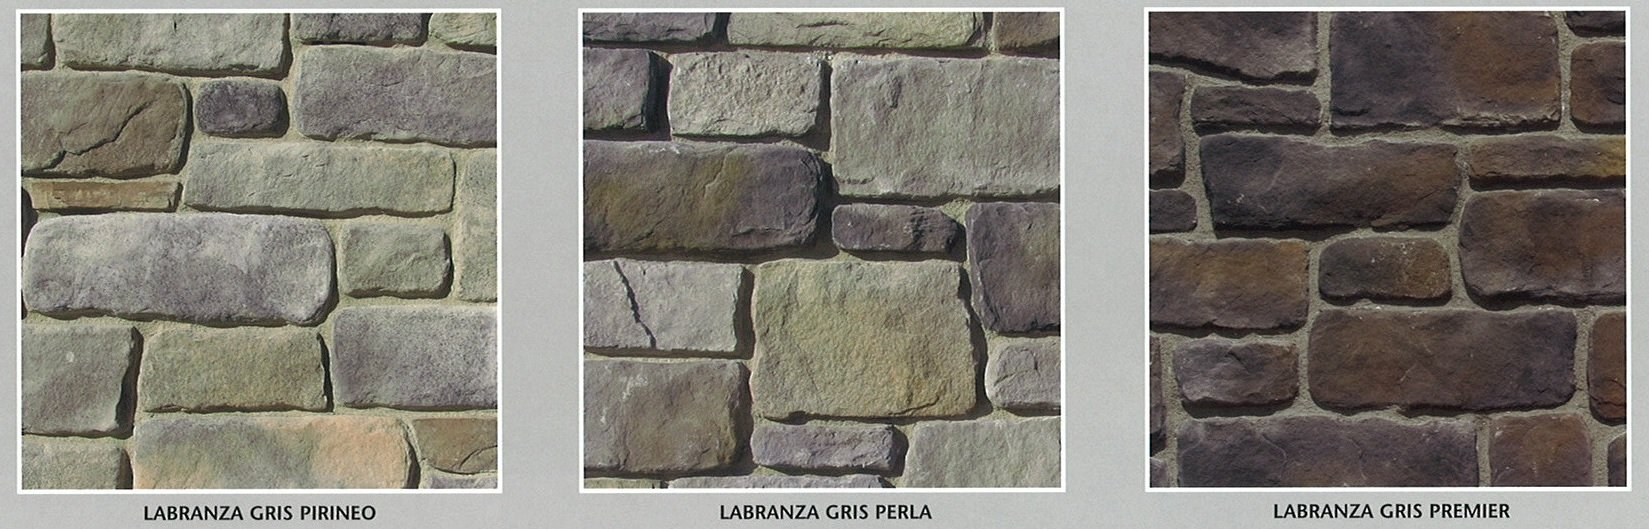 Piedra cultivada artificial modelo labranza cemat gijon - Piedra artificial madrid ...